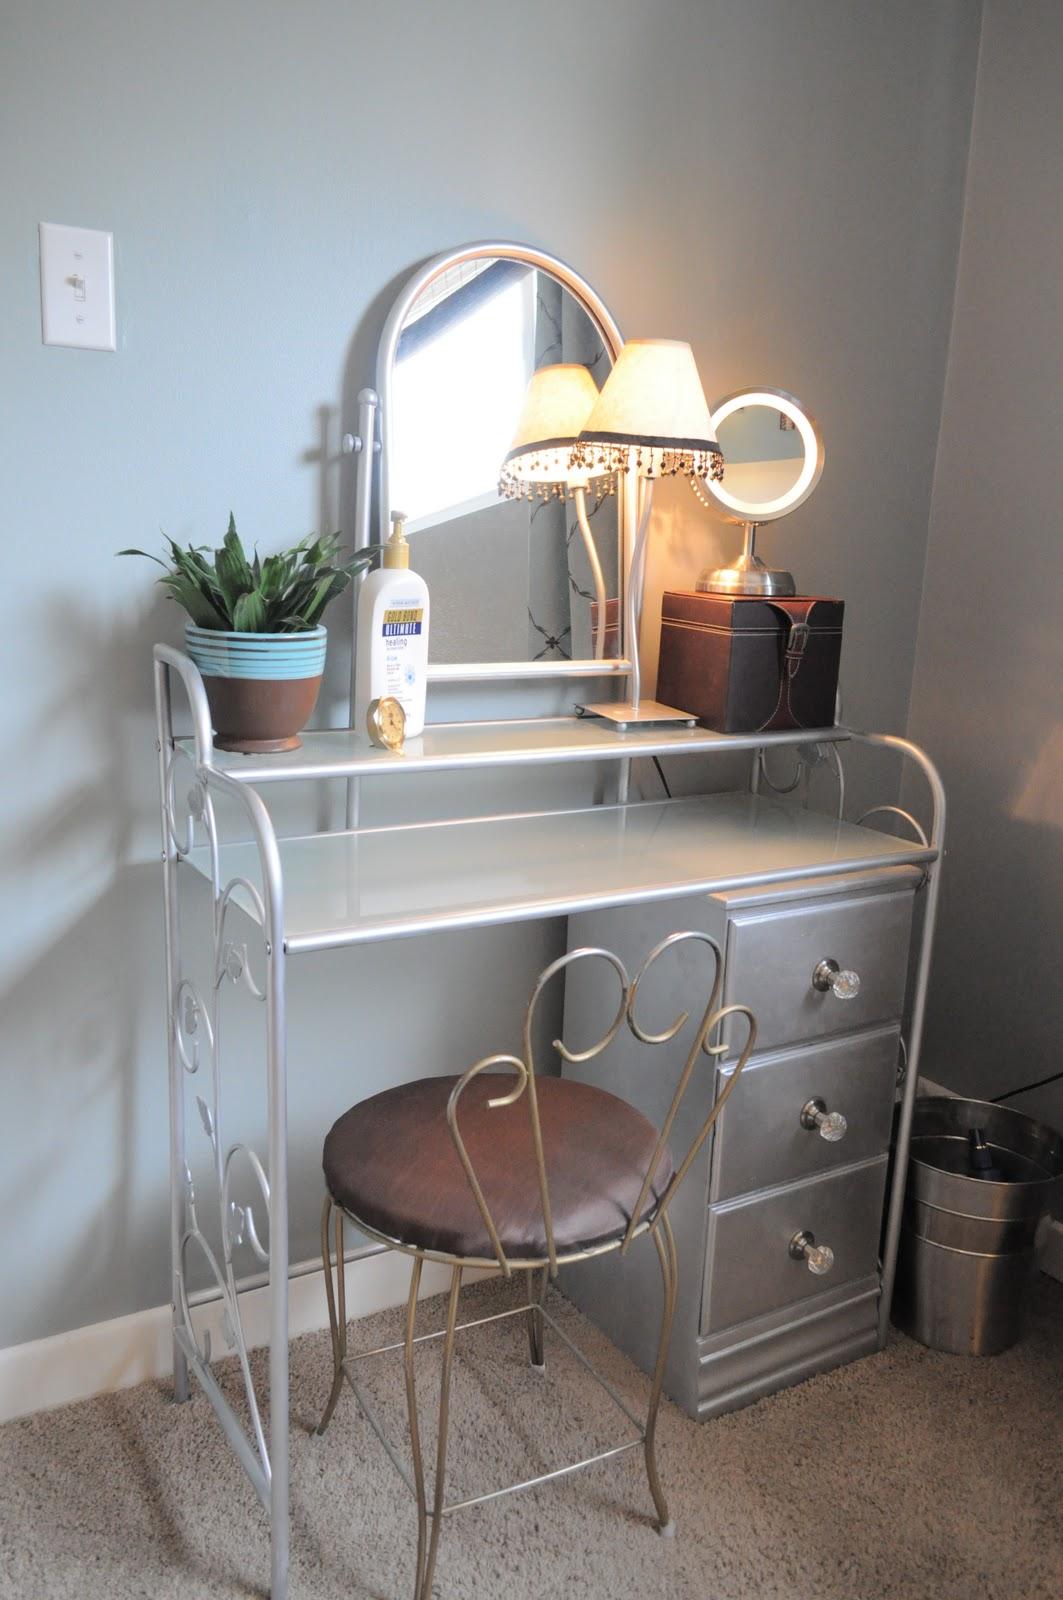 I  Our master bedroom  tricks to make it feel bigger   organized  . Organizing Bedroom. Home Design Ideas